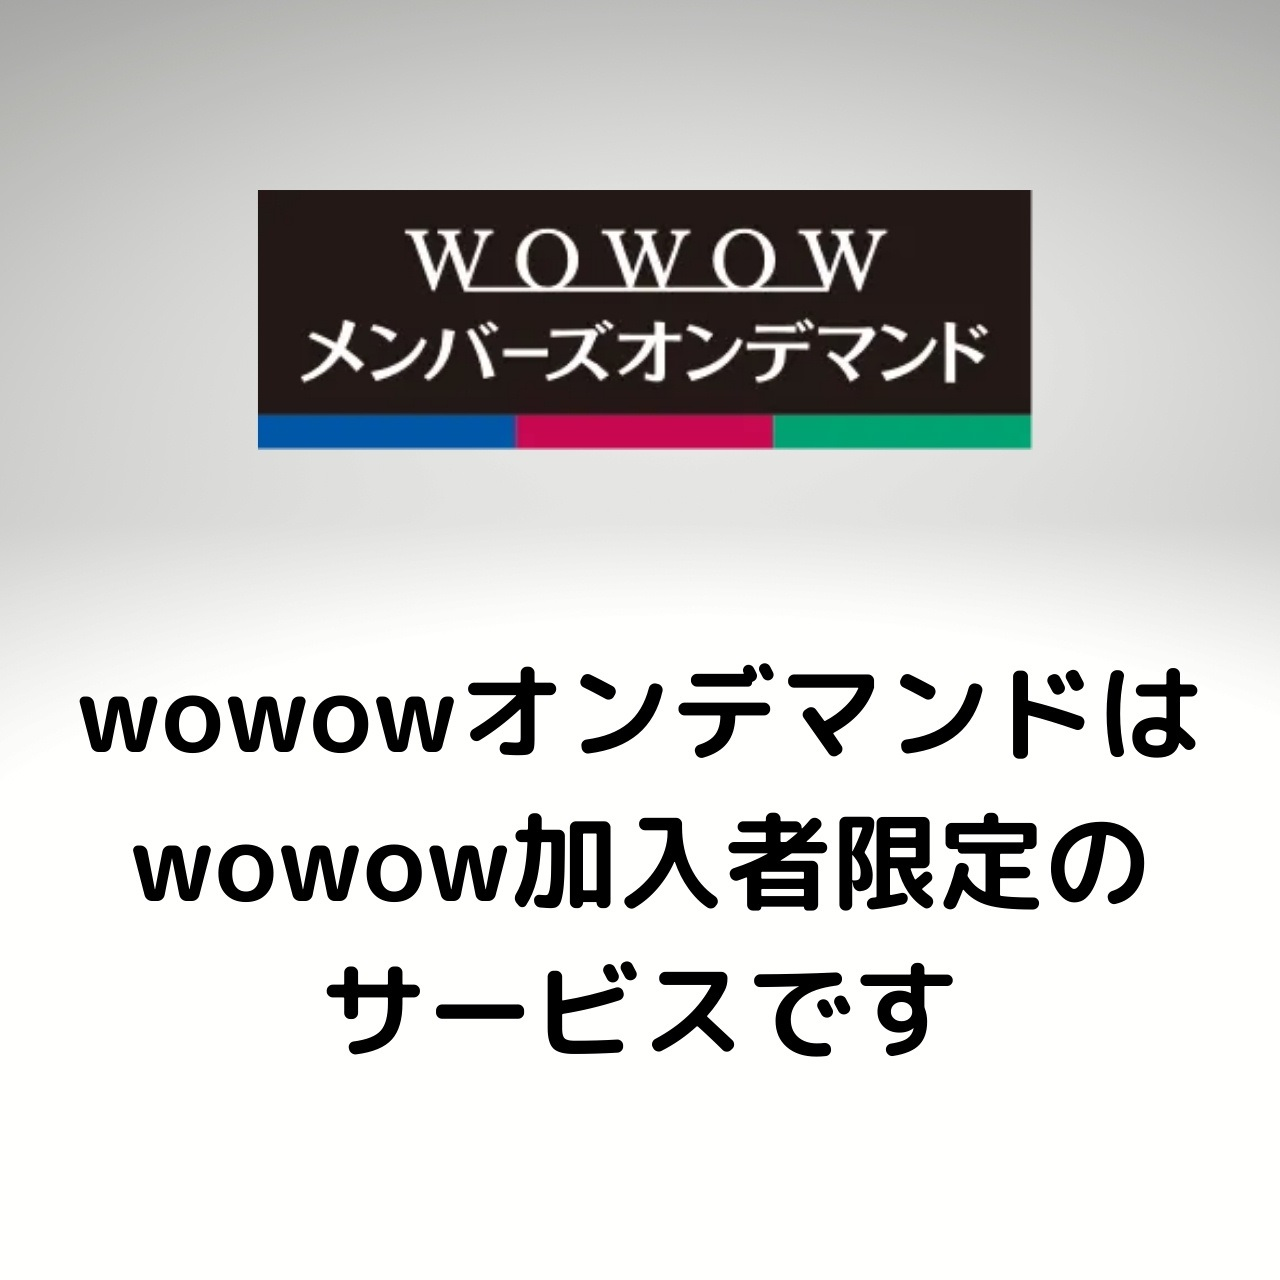 wowowオンデマンドはwowow加入者限定のサービスです